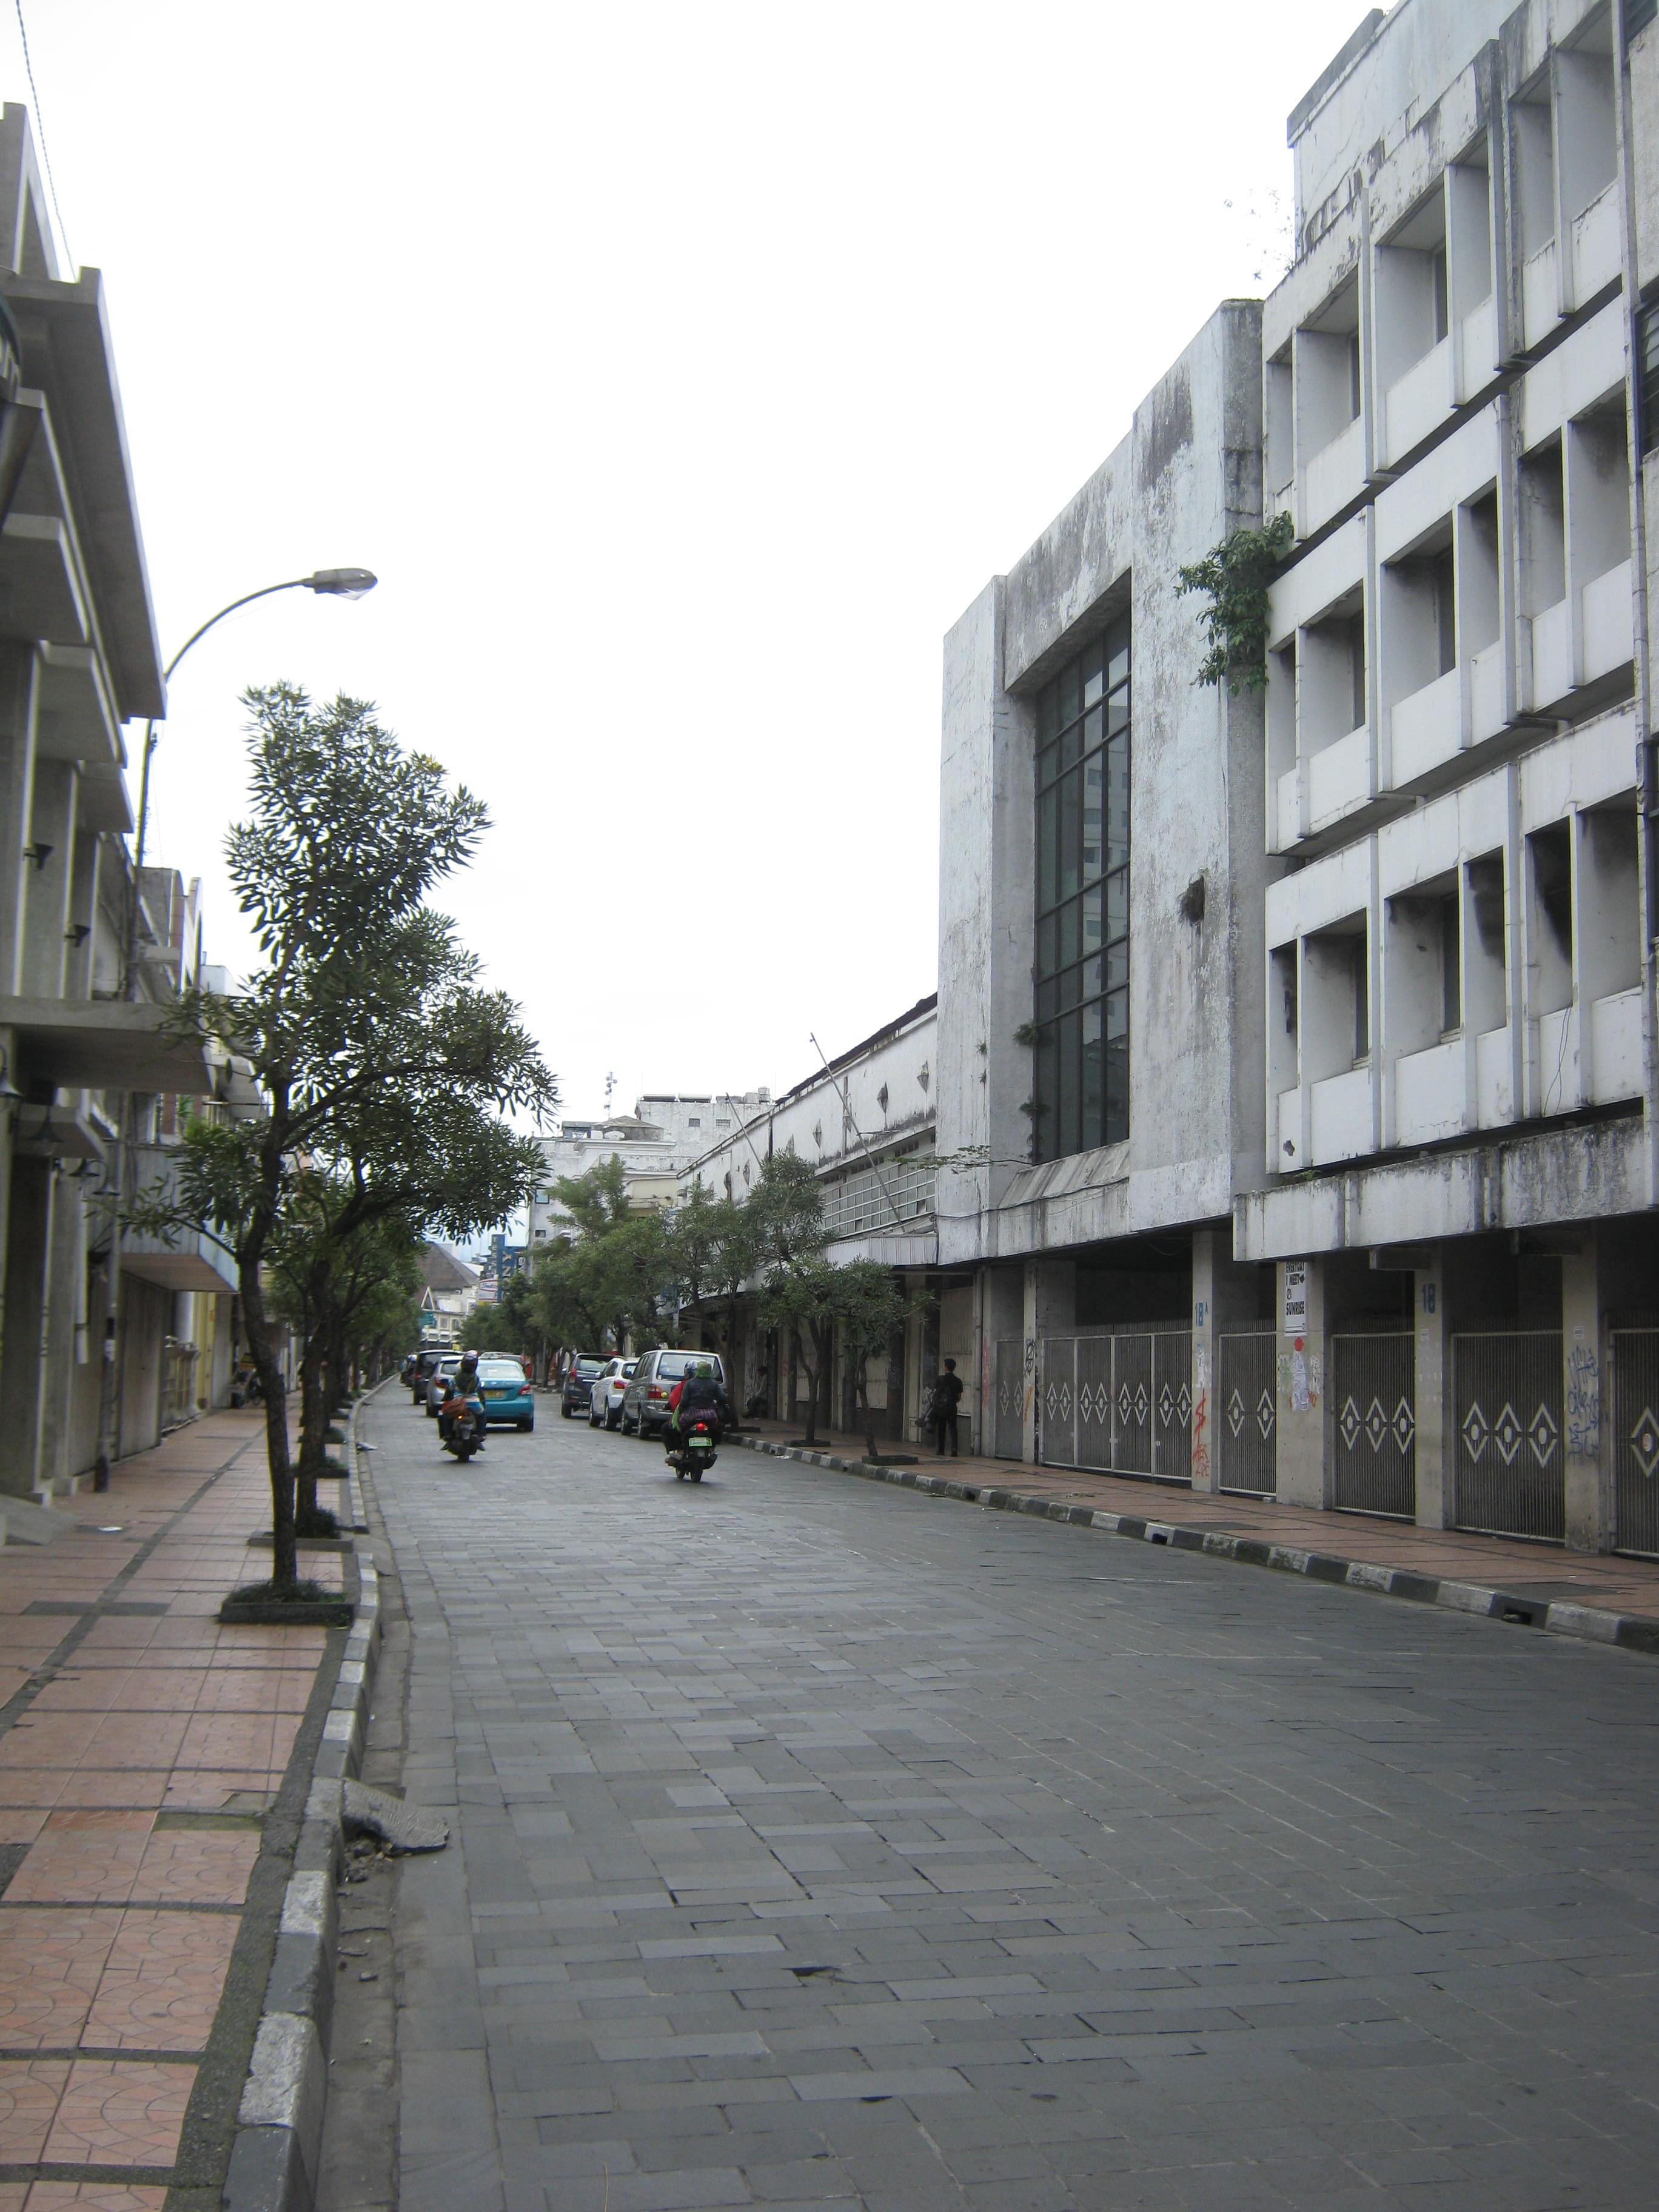 Numpang Lewat Jalan Braga Bandung Mirza Sahadat Img 0765 Kab